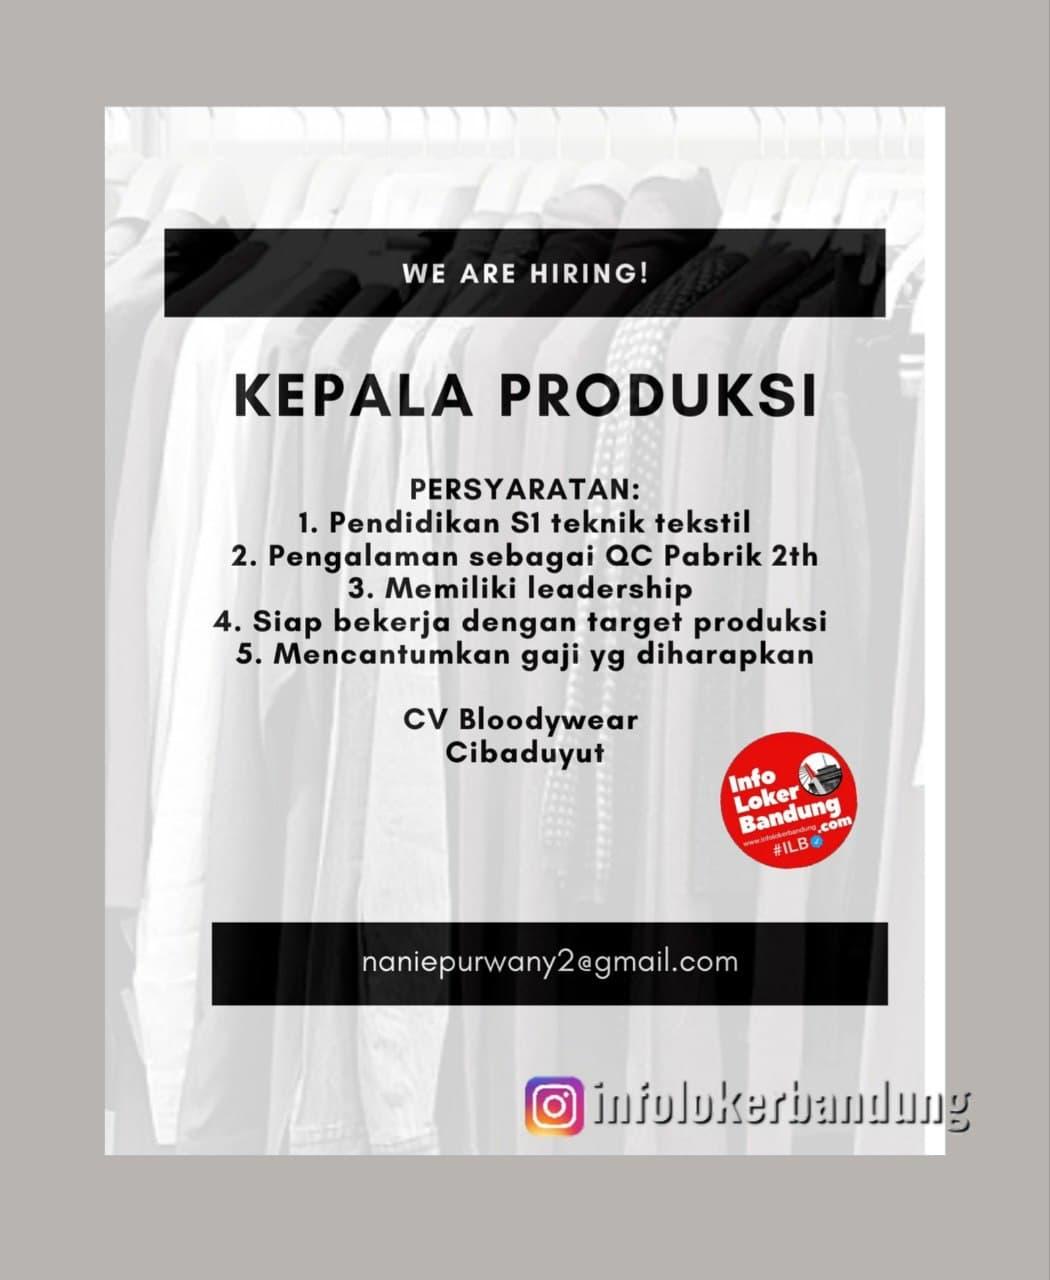 Lowongan Kerja Kepala Produksi CV Bloodywear Bandung Mei 2021